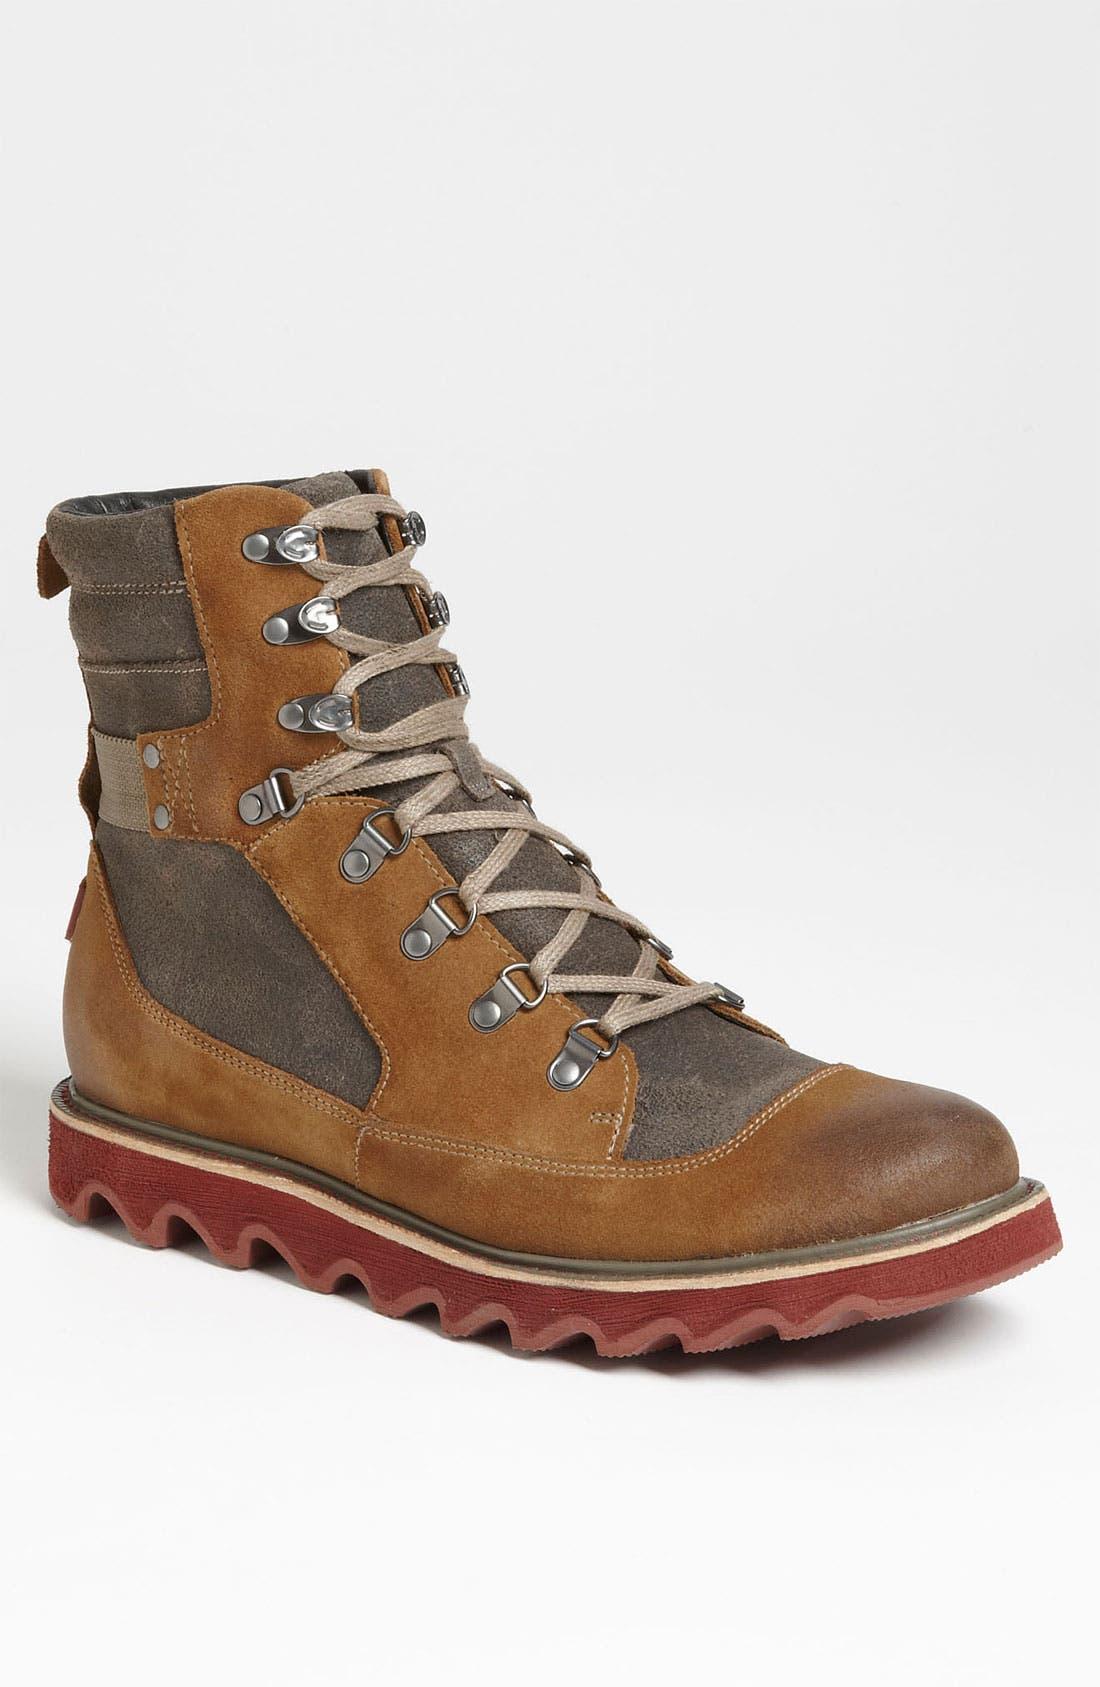 Alternate Image 1 Selected - SOREL 'Mad Mukluk' Boot